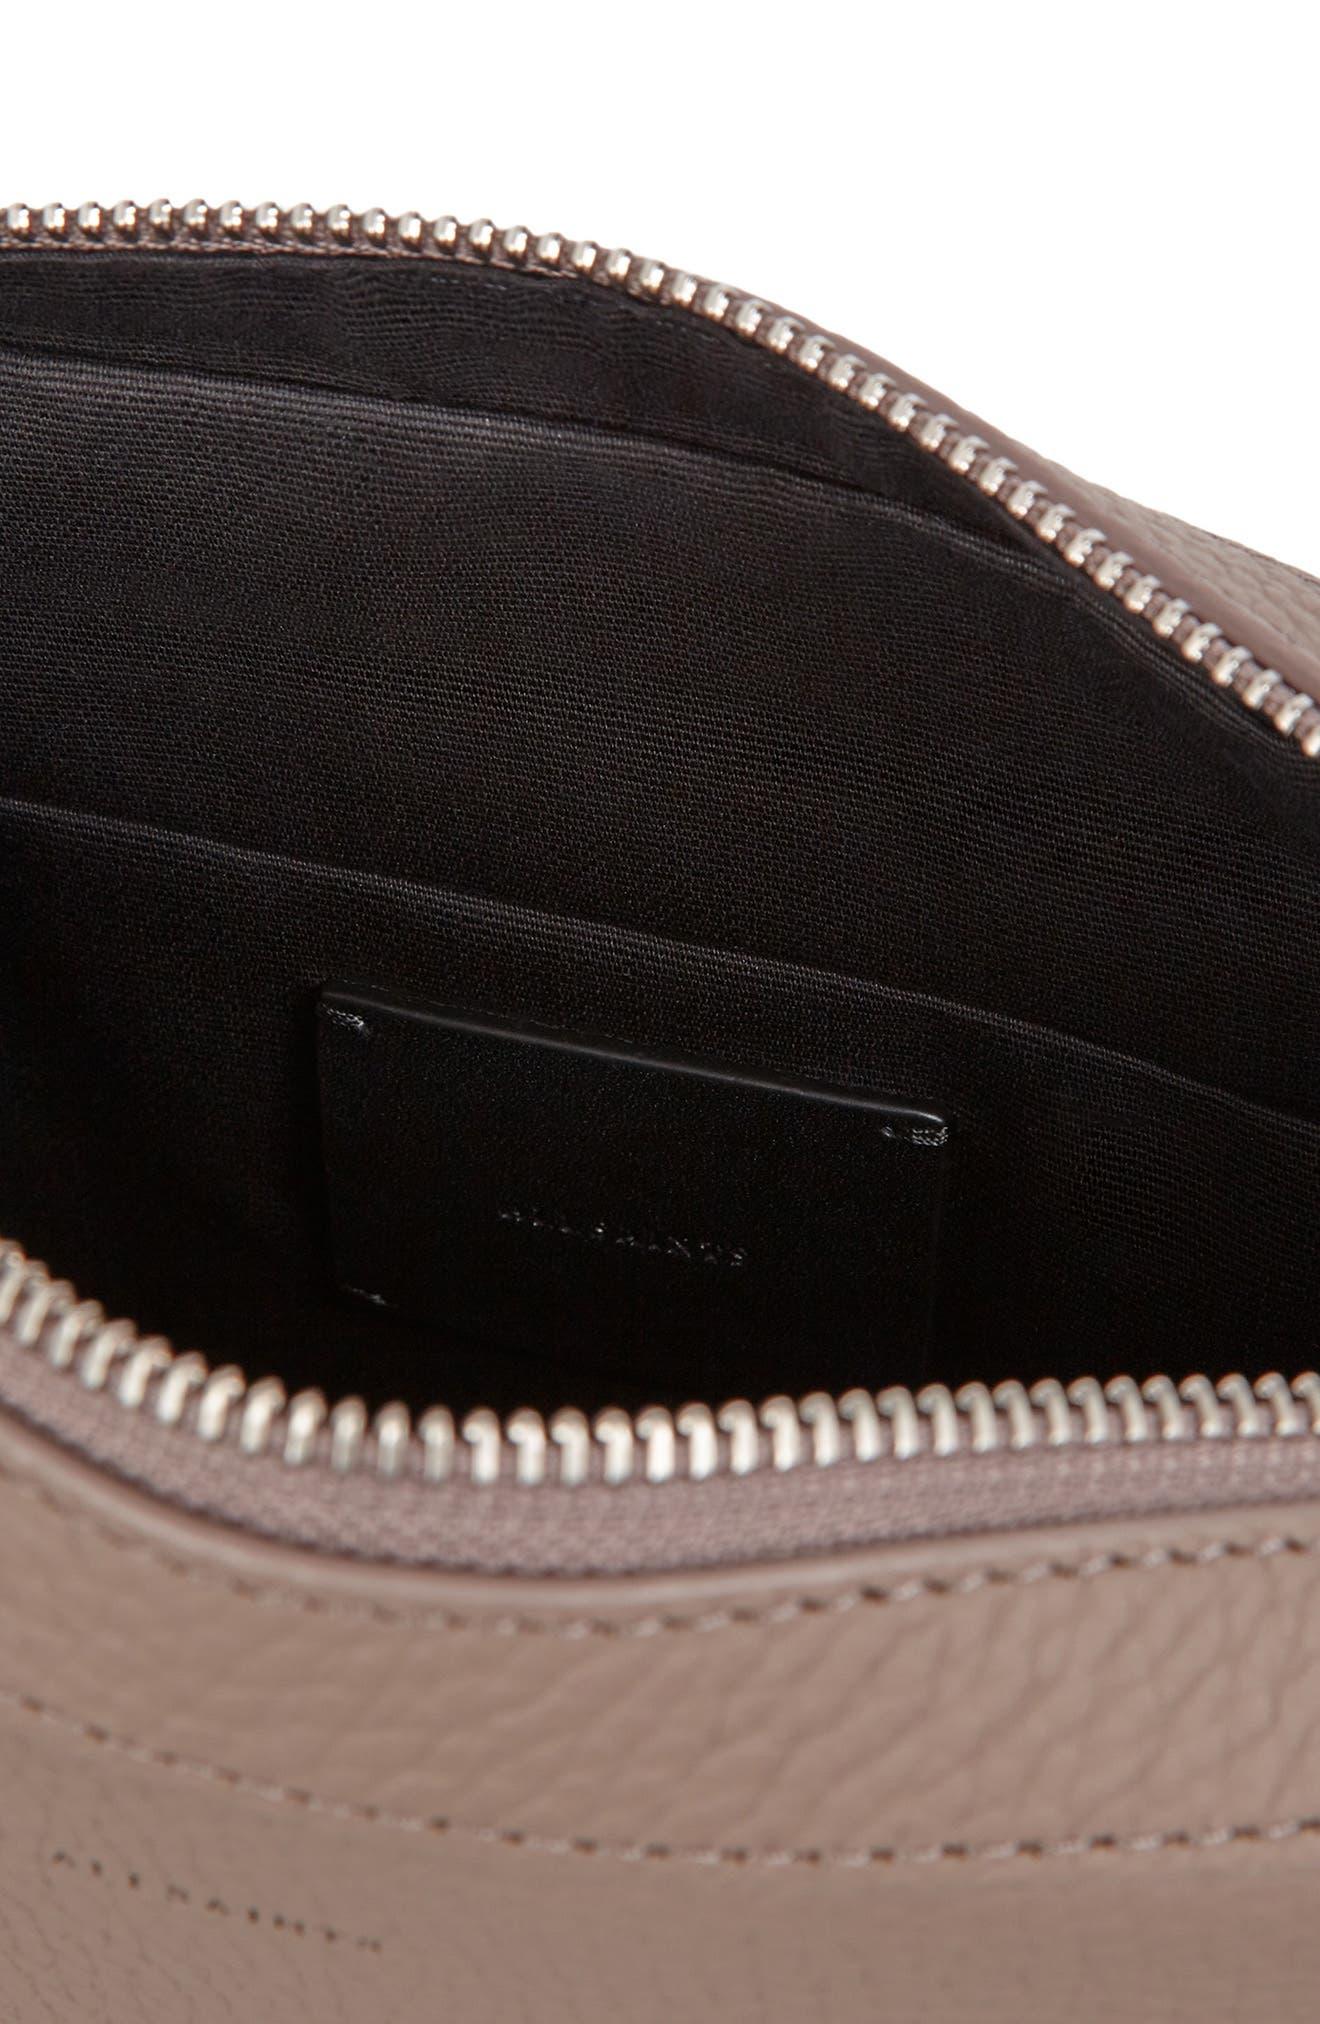 Kepi Mini Leather Crossbody Bag,                             Alternate thumbnail 4, color,                             ALMOND BROWN